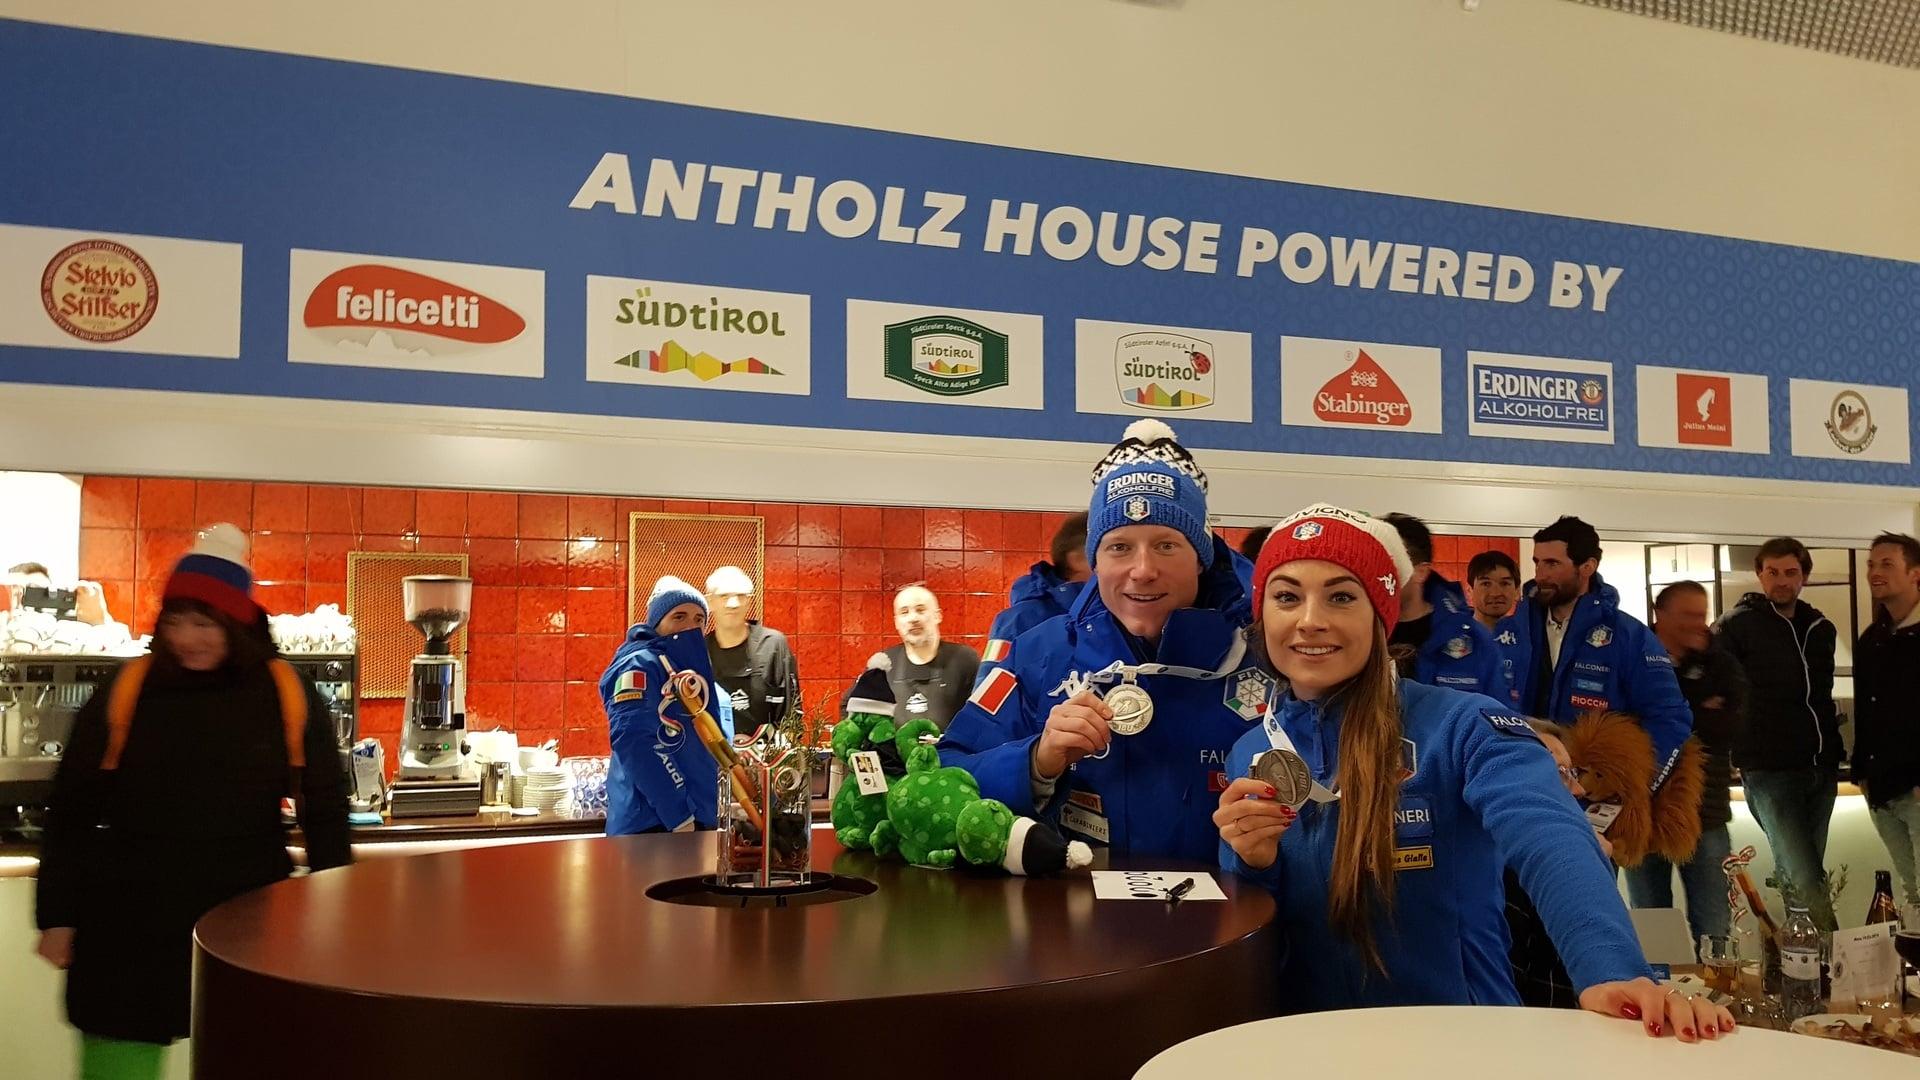 15.03.2019 - Dorothea Wierer e Lukas Hofer hanno festeggiato l'argento Mondiale all'Antholz House!